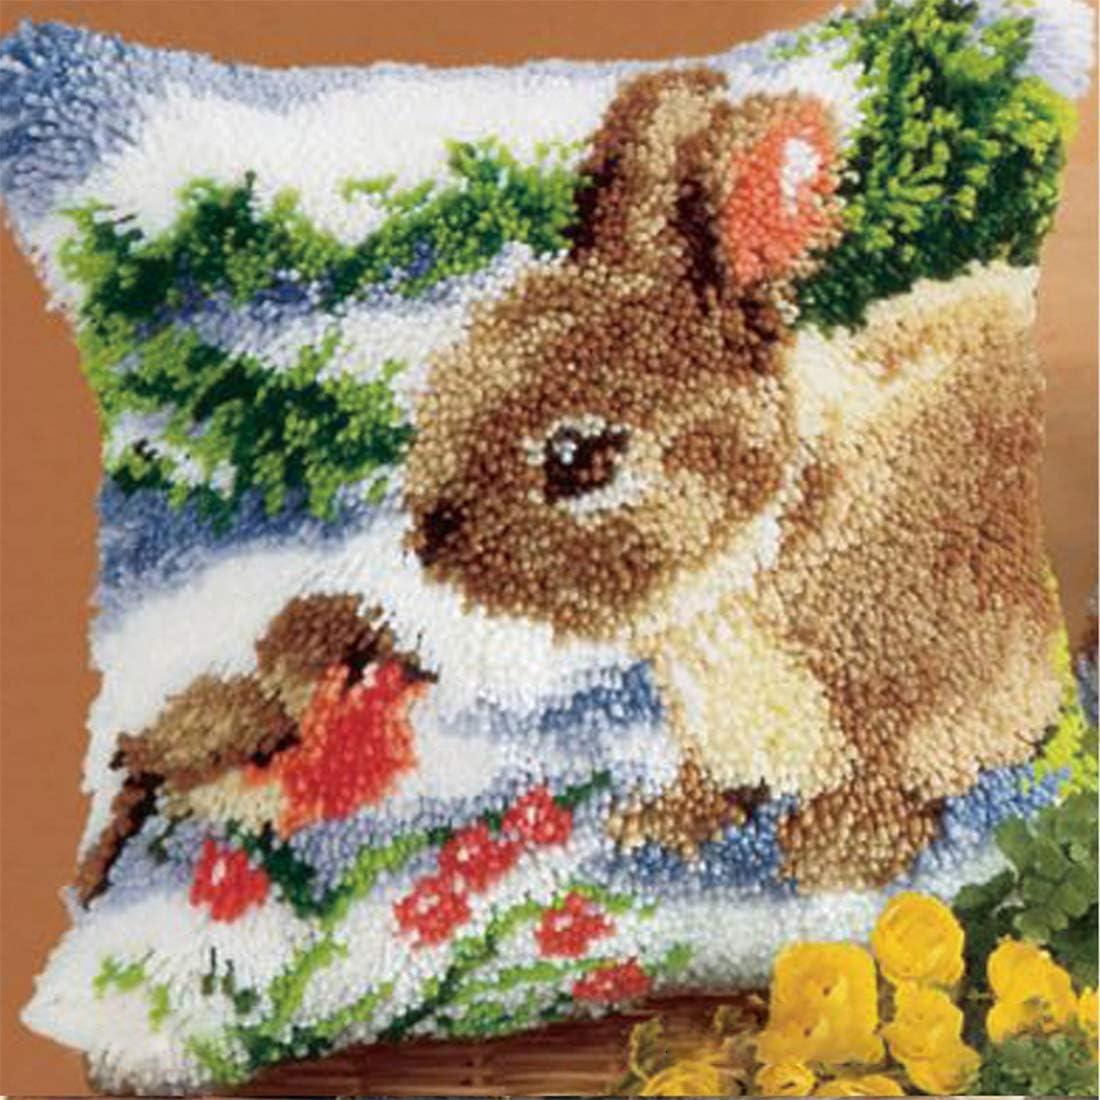 K9CK Latch Hook Kits DIY Animal Theme Carpet Cushion Crocheting Pillowcase Rabbit Rug Sewing Craft Kit Creative Gift for Kids//Adults Beginner